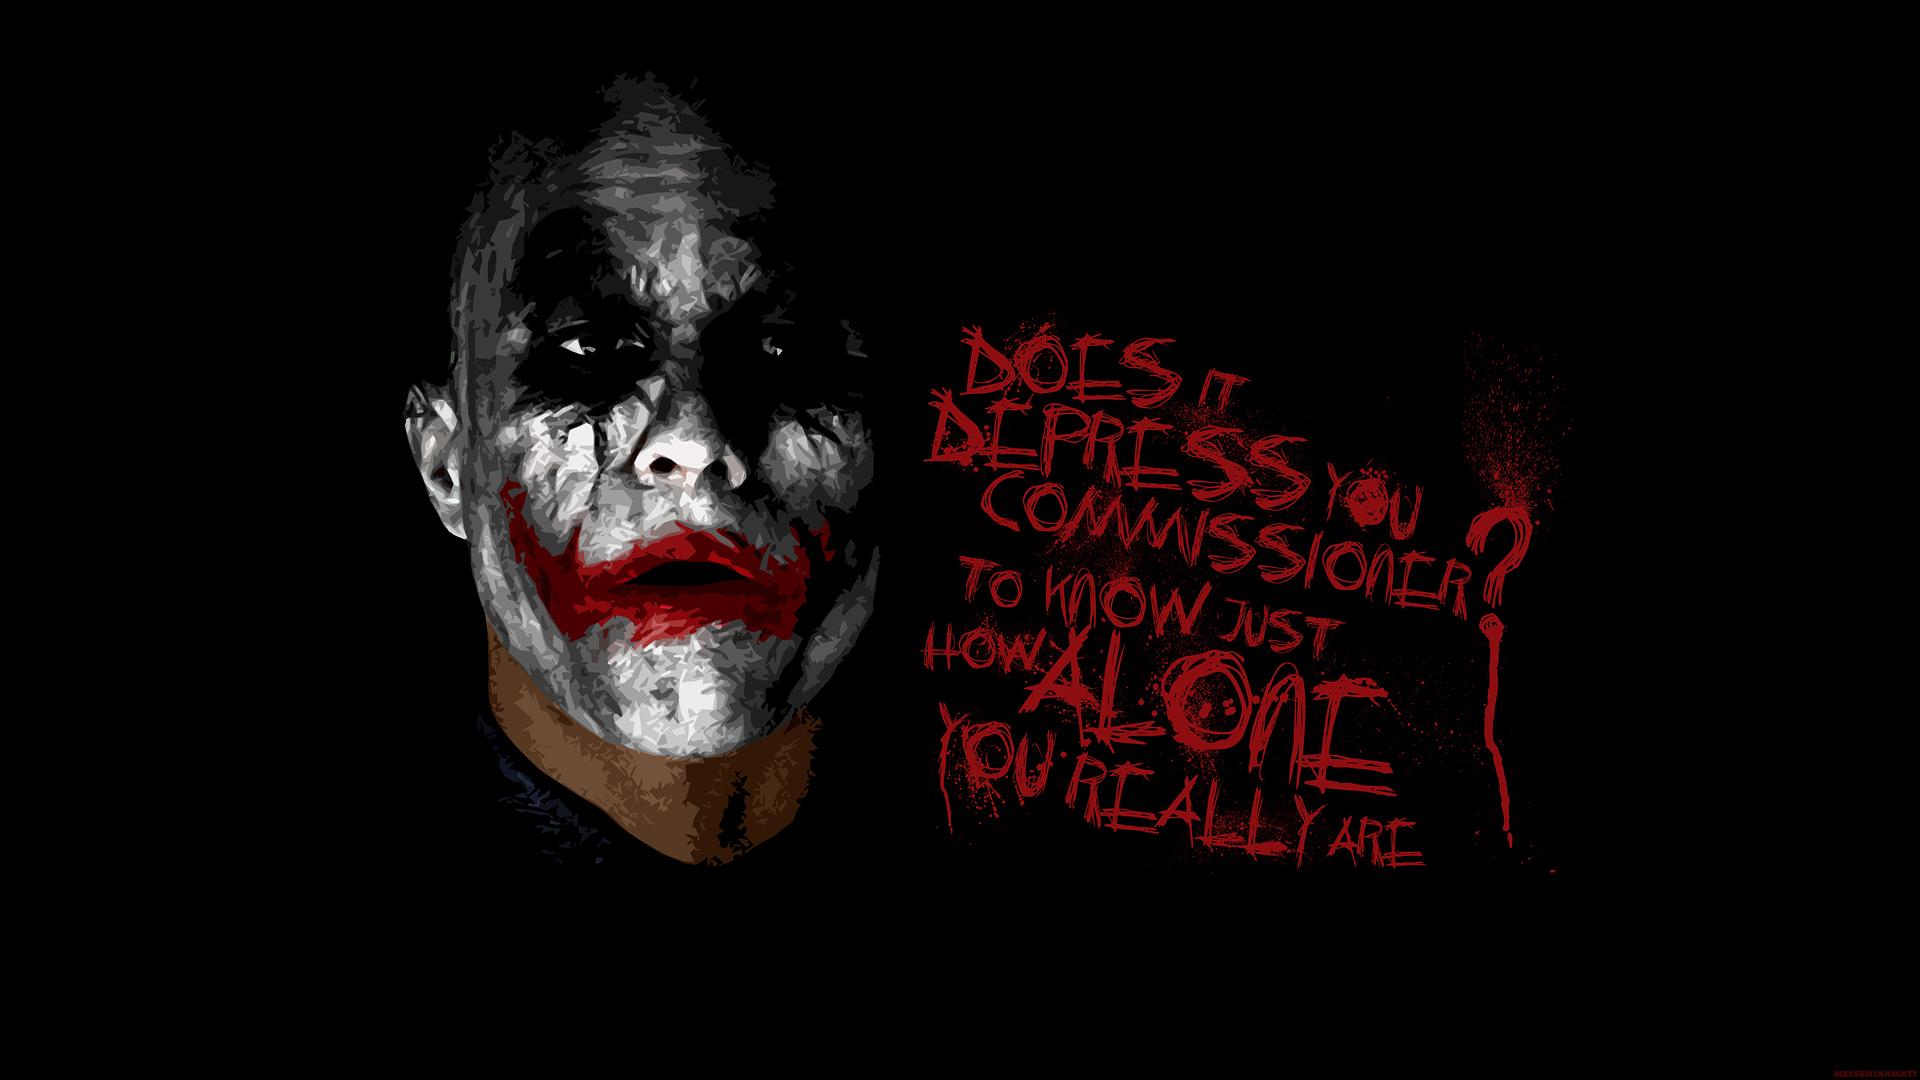 Batman Movie Wallpapers Joker HD Wallpaper Movies Wallpapers 1920x1080